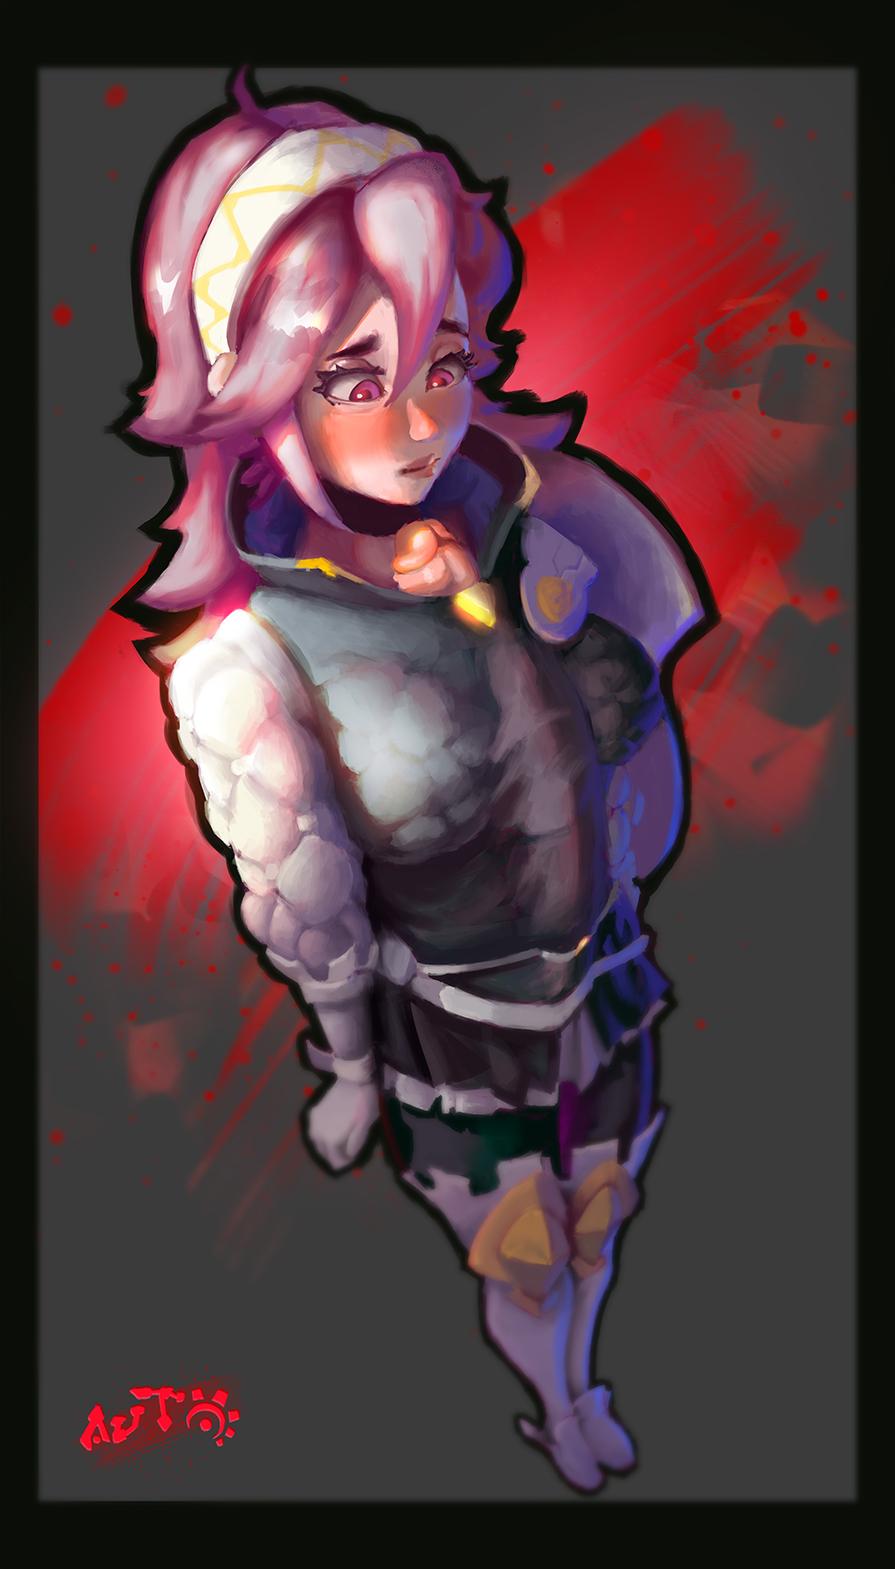 soleil fates hentai fire emblem :middle_finger: